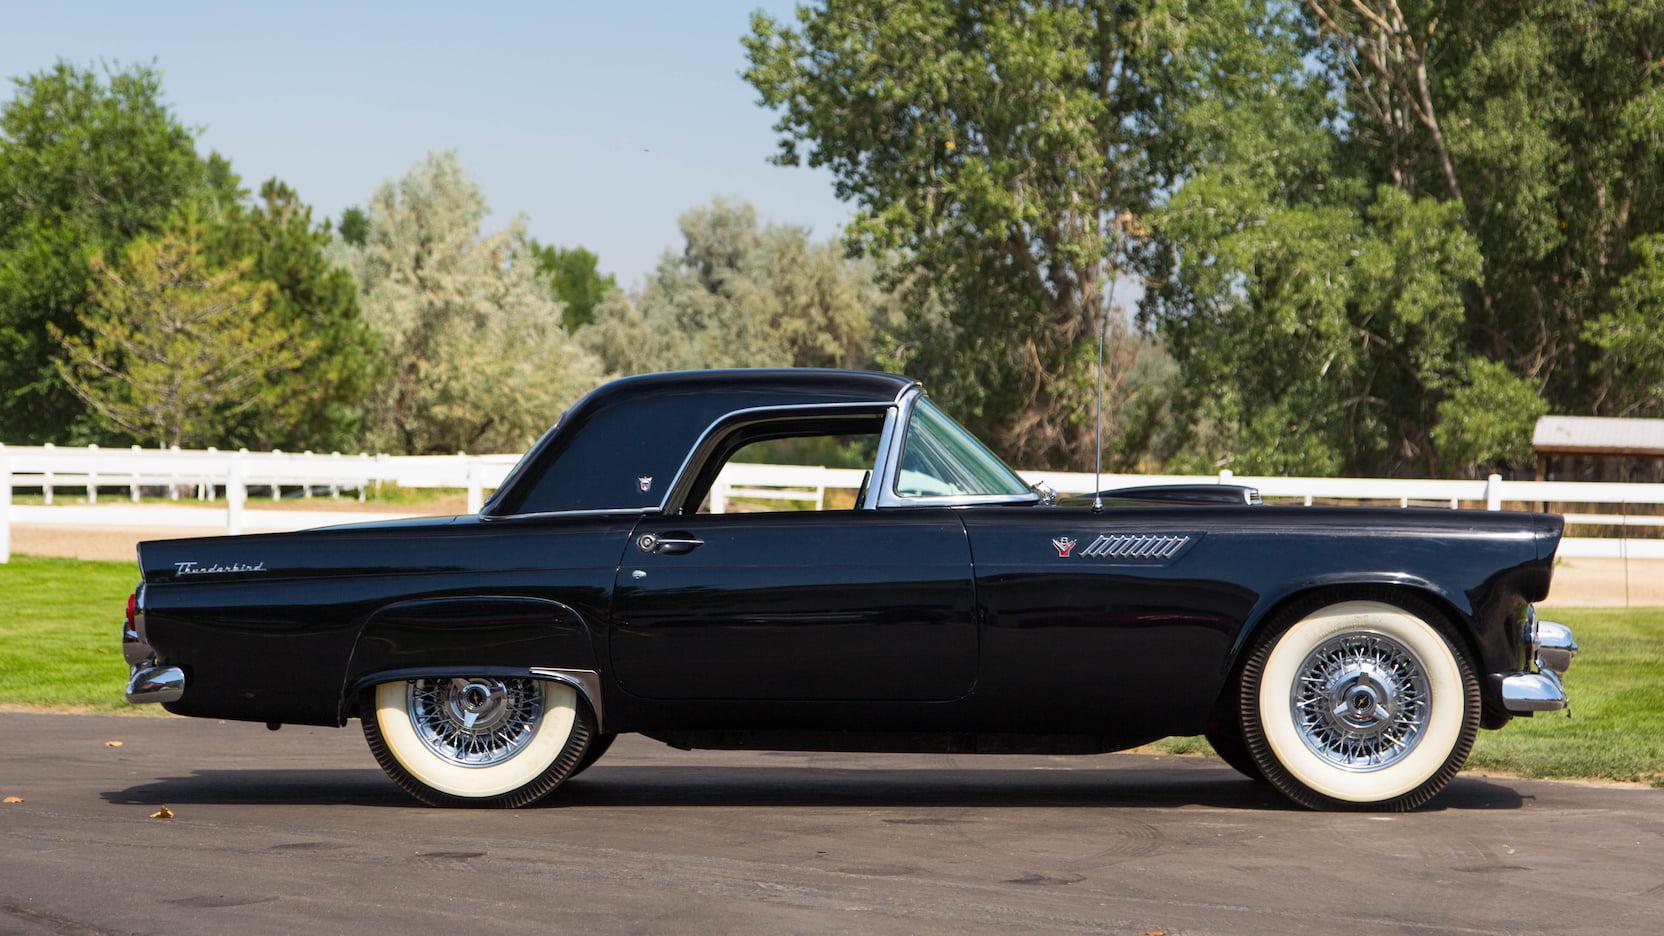 1955 Ford Thunderbird side profile